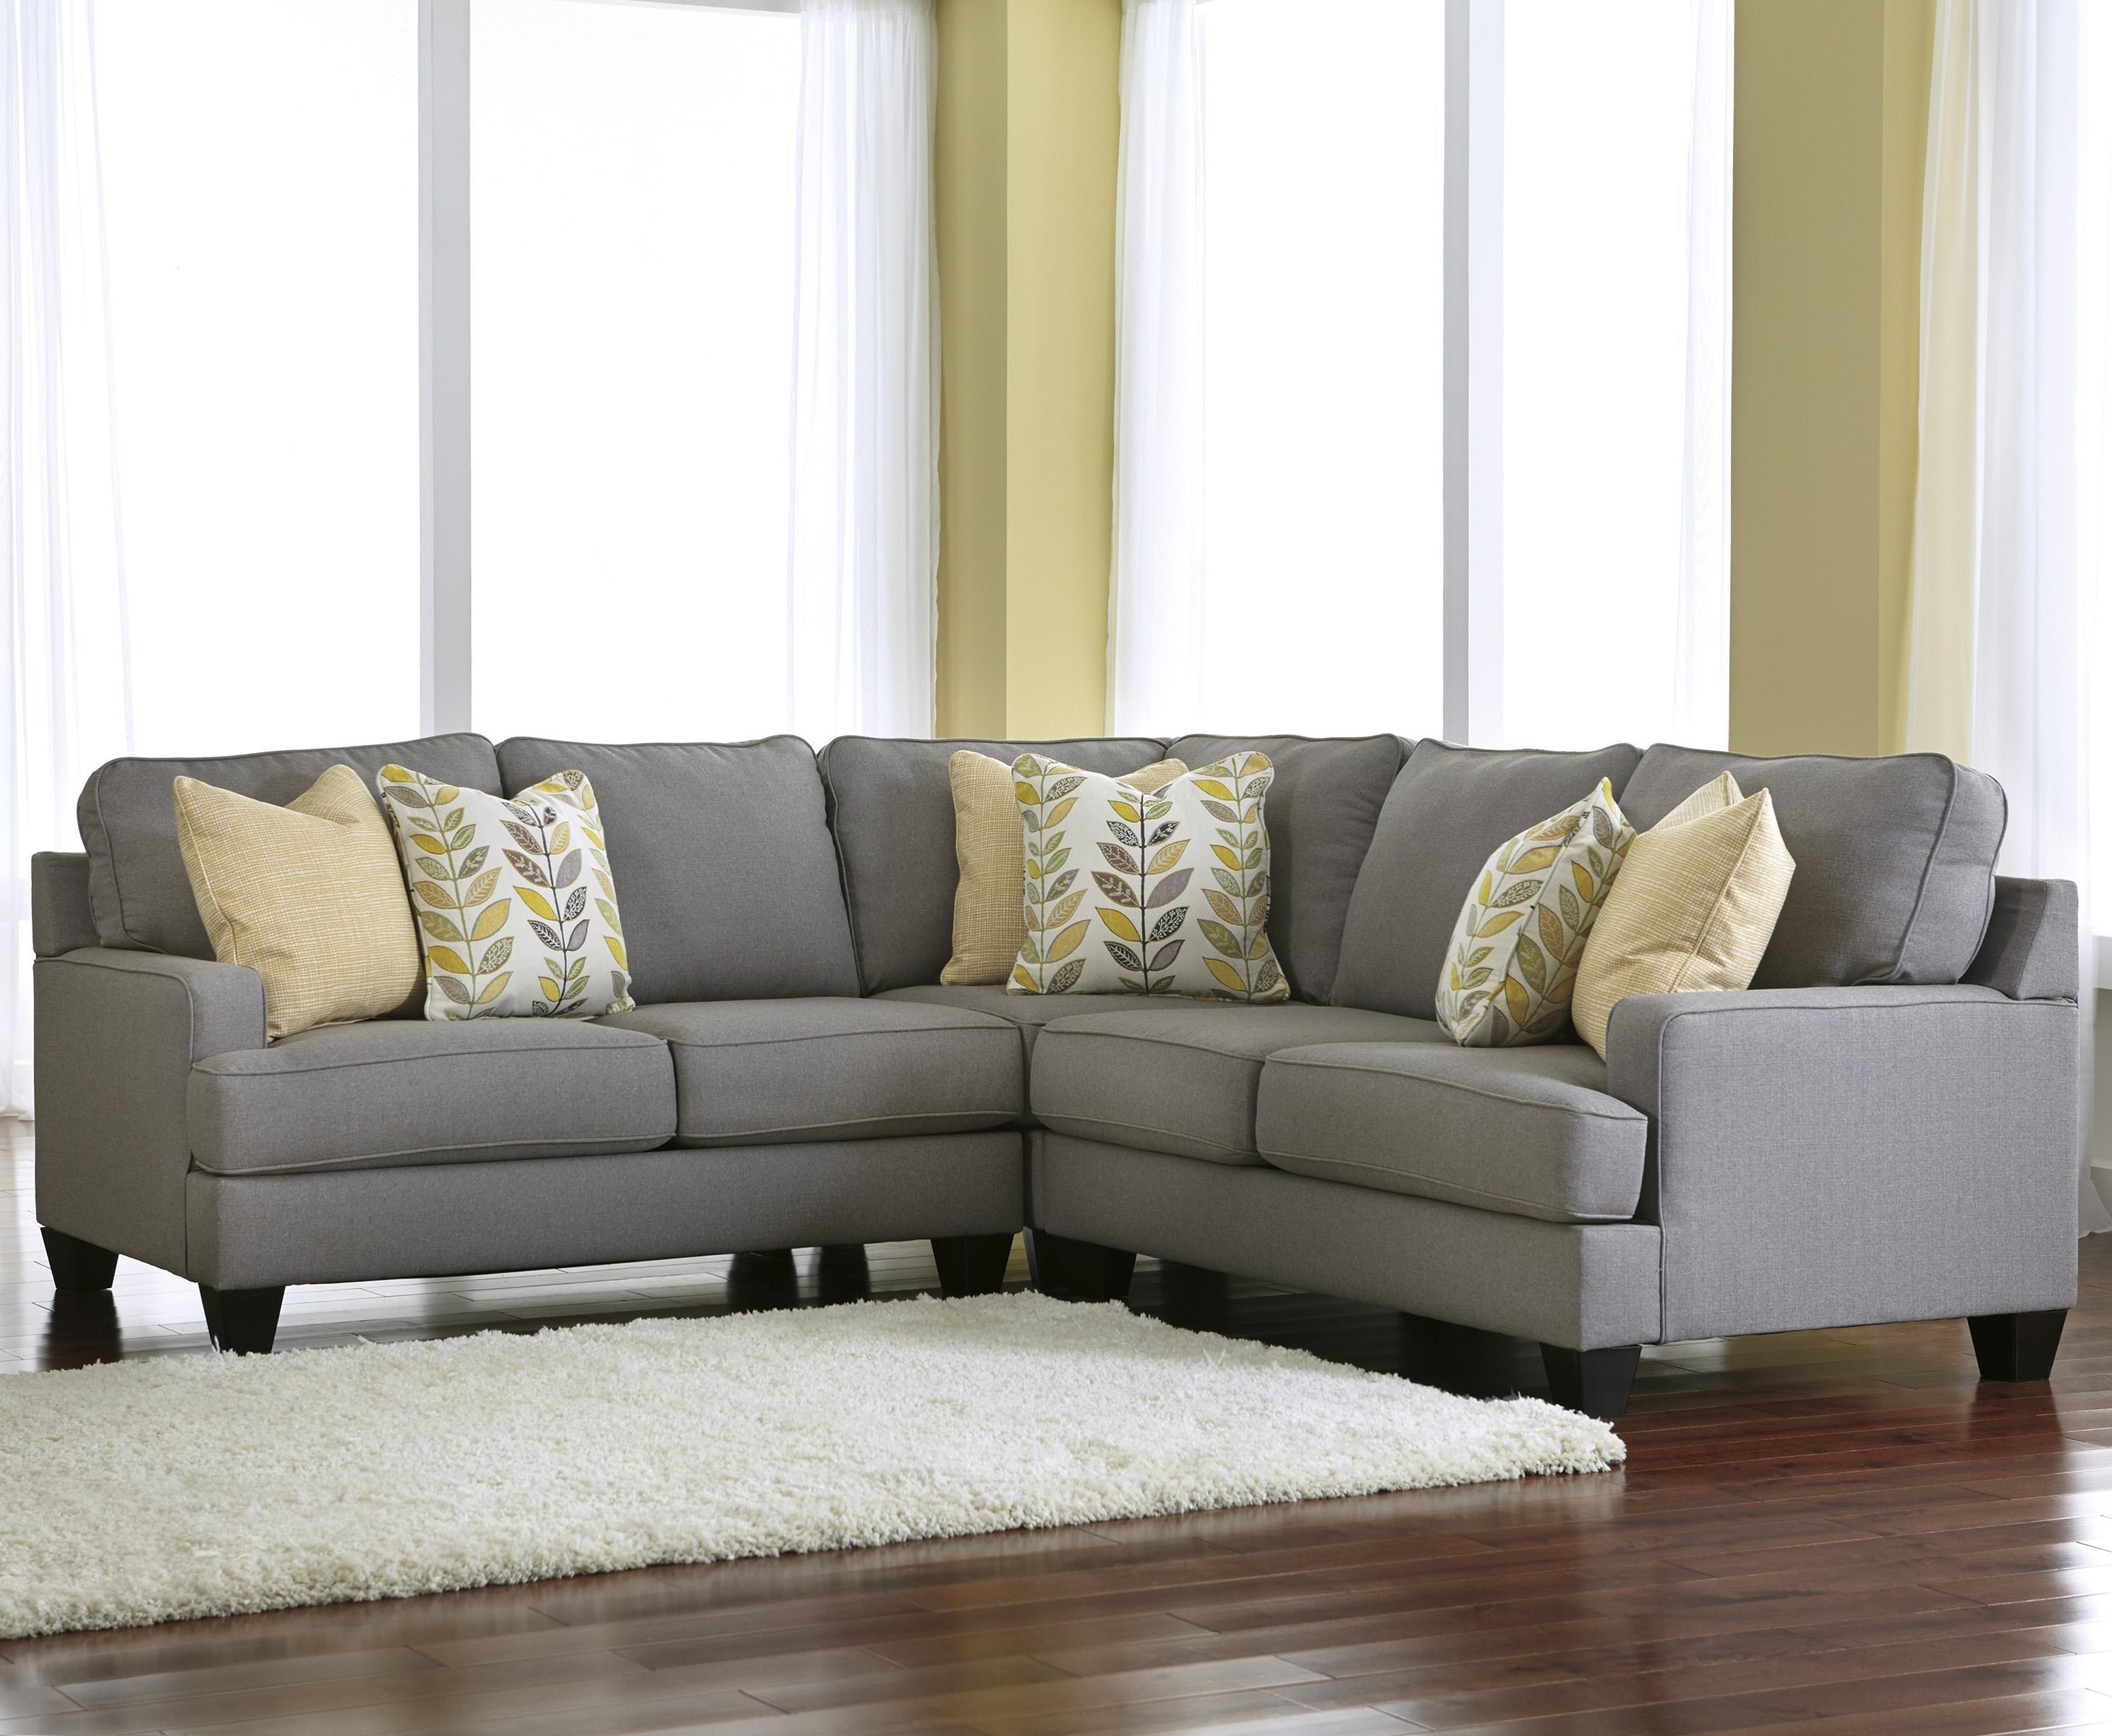 sofas birmingham danish tan leather sofa uk 10 best ideas sectional at al